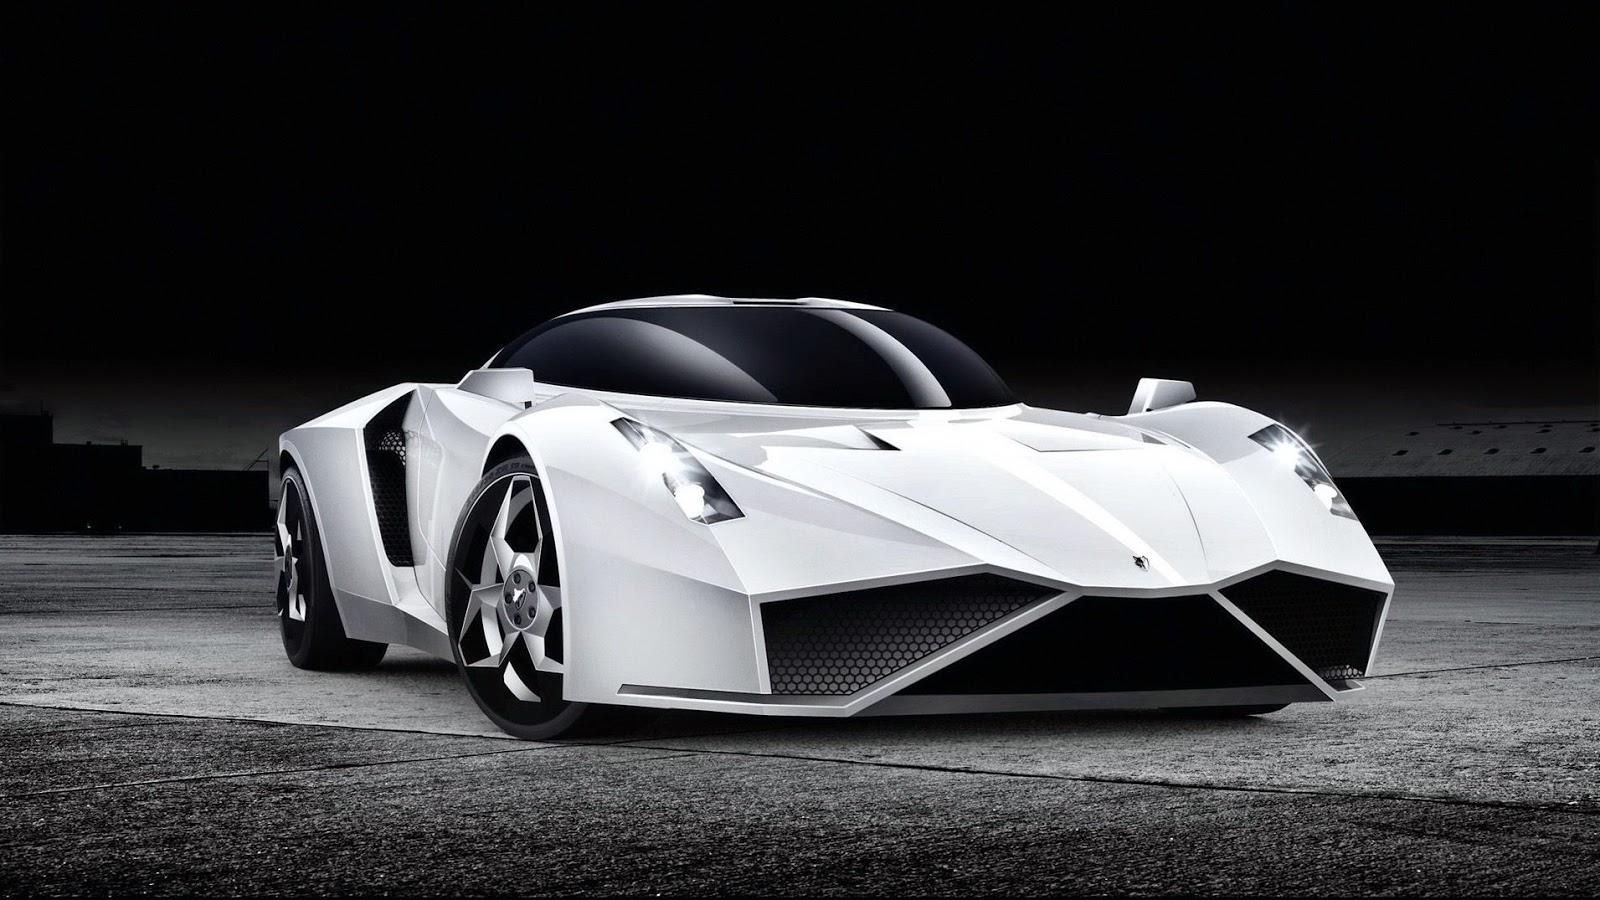 ferrari enzo white wallpaper car free download - Ferrari Enzo 2013 White